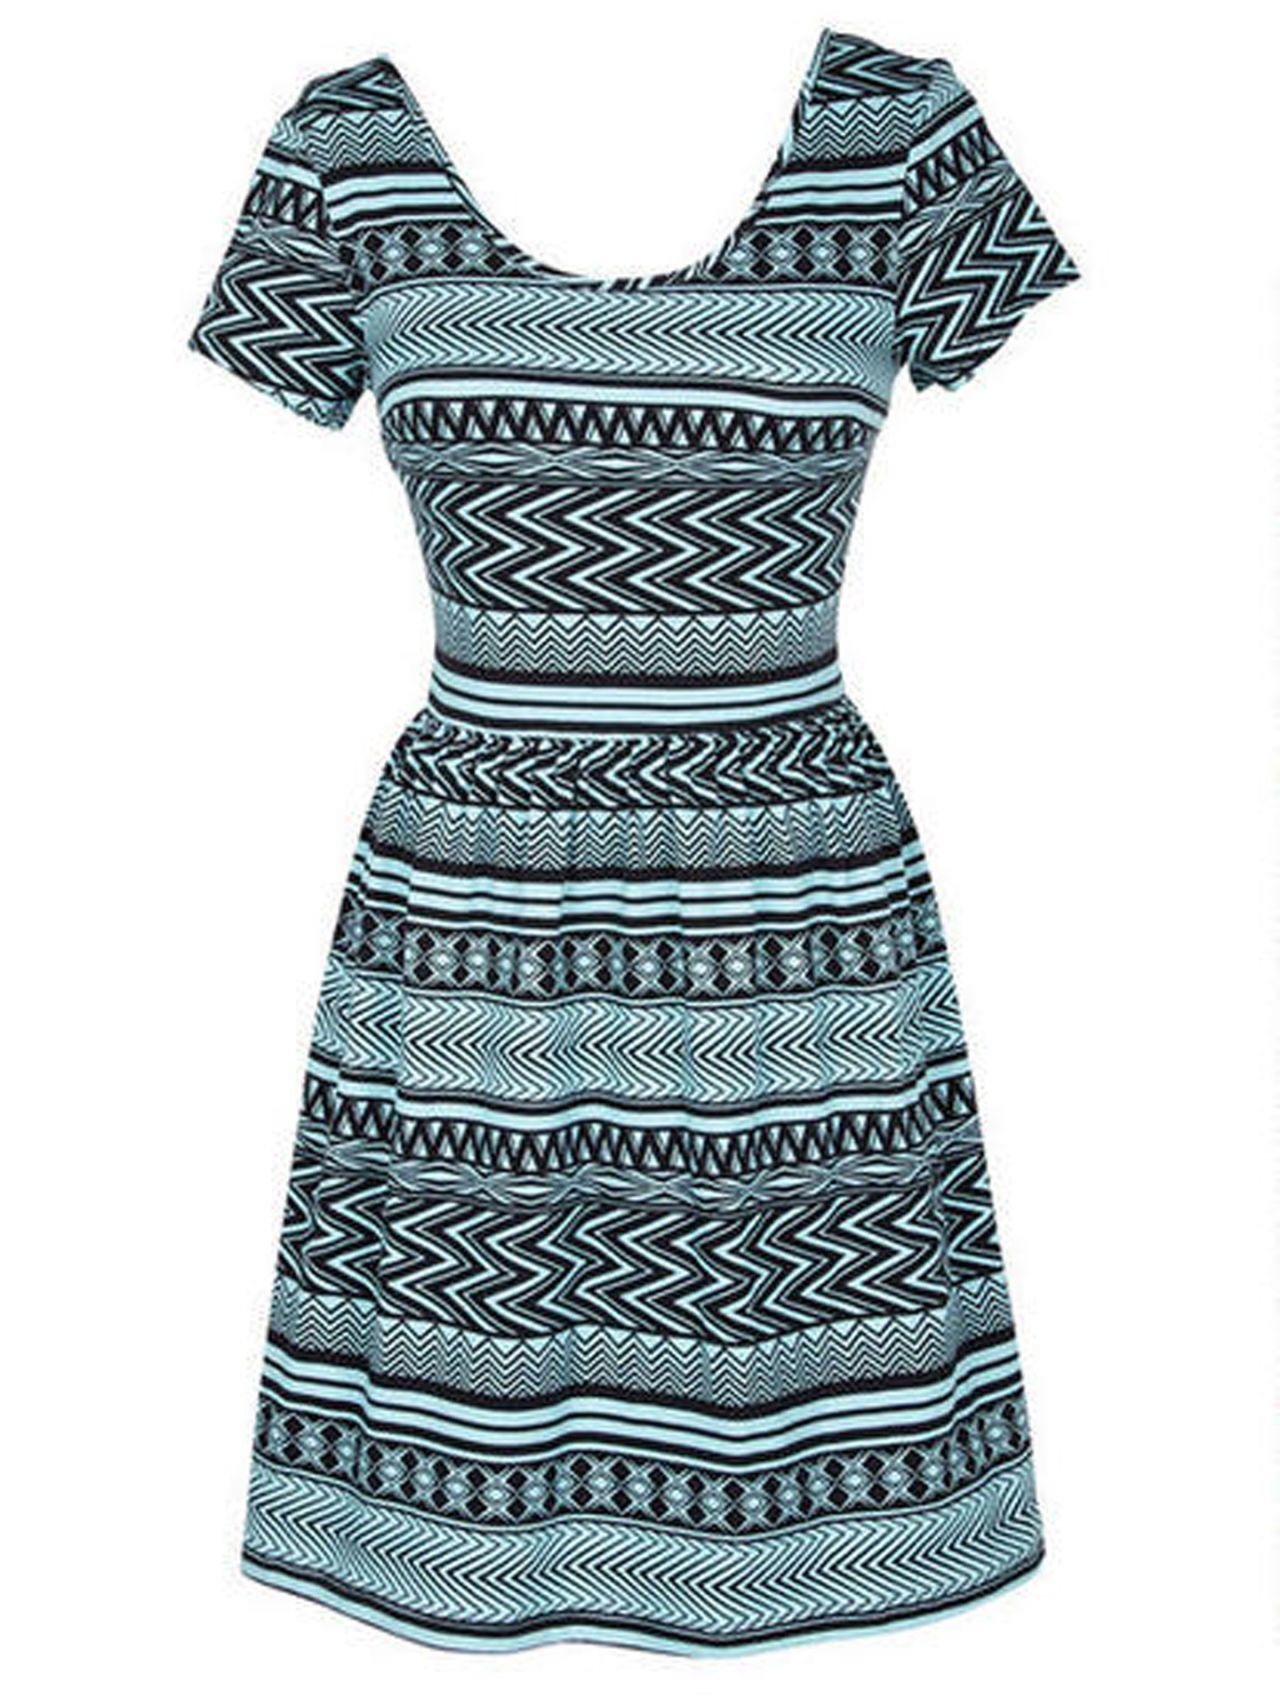 e337f528ede Hot Summer Dresses Under 50 - Inexpensive Summer Dresses